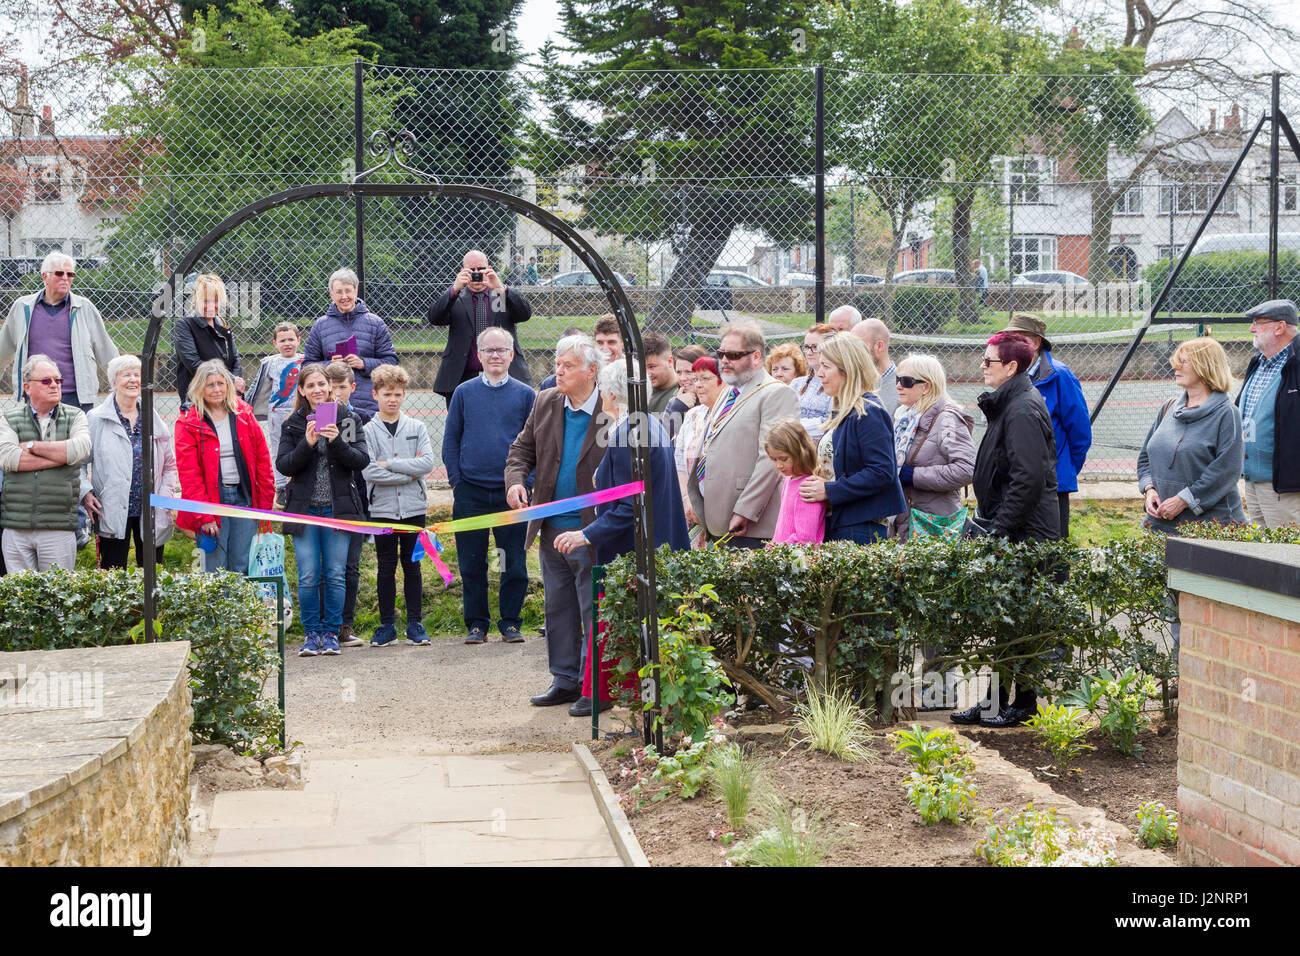 Abington Park, Northampton, U.K. 30th April 2017. A new sensory garden created by the Friends of Abington Park after - Stock Image